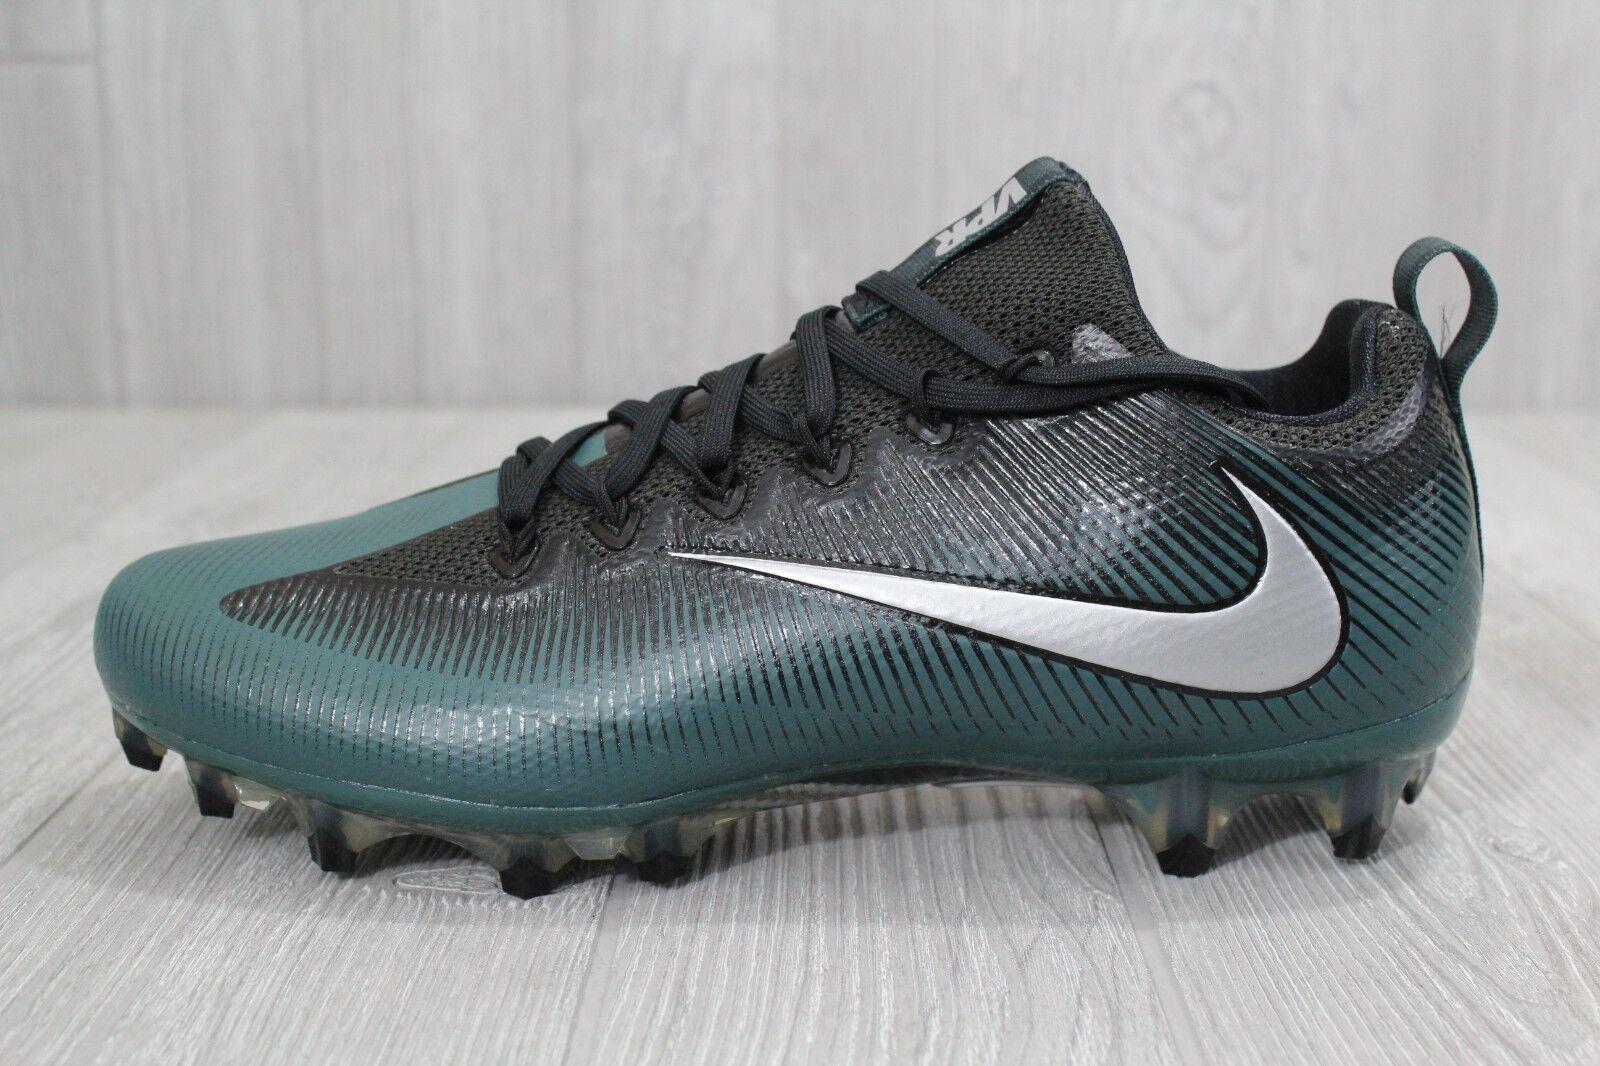 25 Nike Vapor Untouchable Pro Football Cleats Green Black 839924-324 10 -11.5